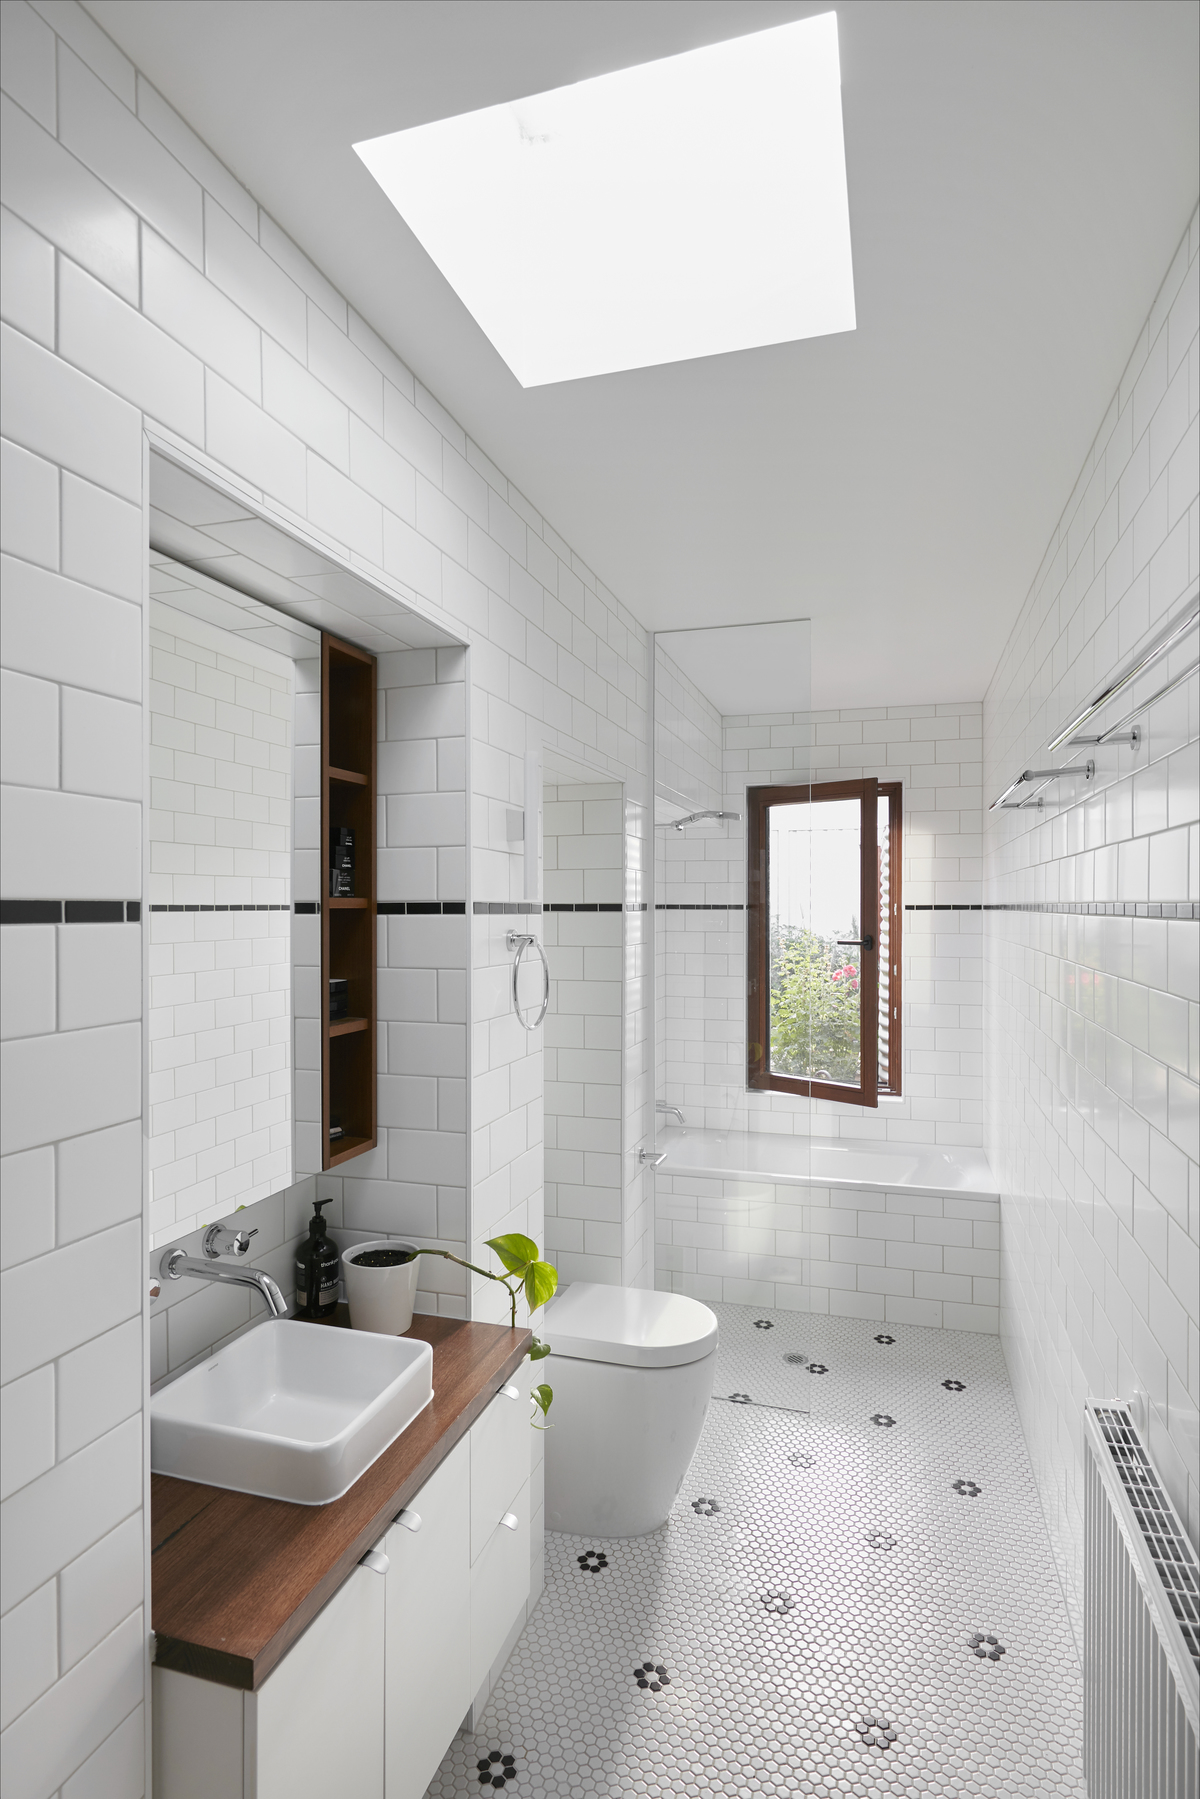 The skinny bathroom